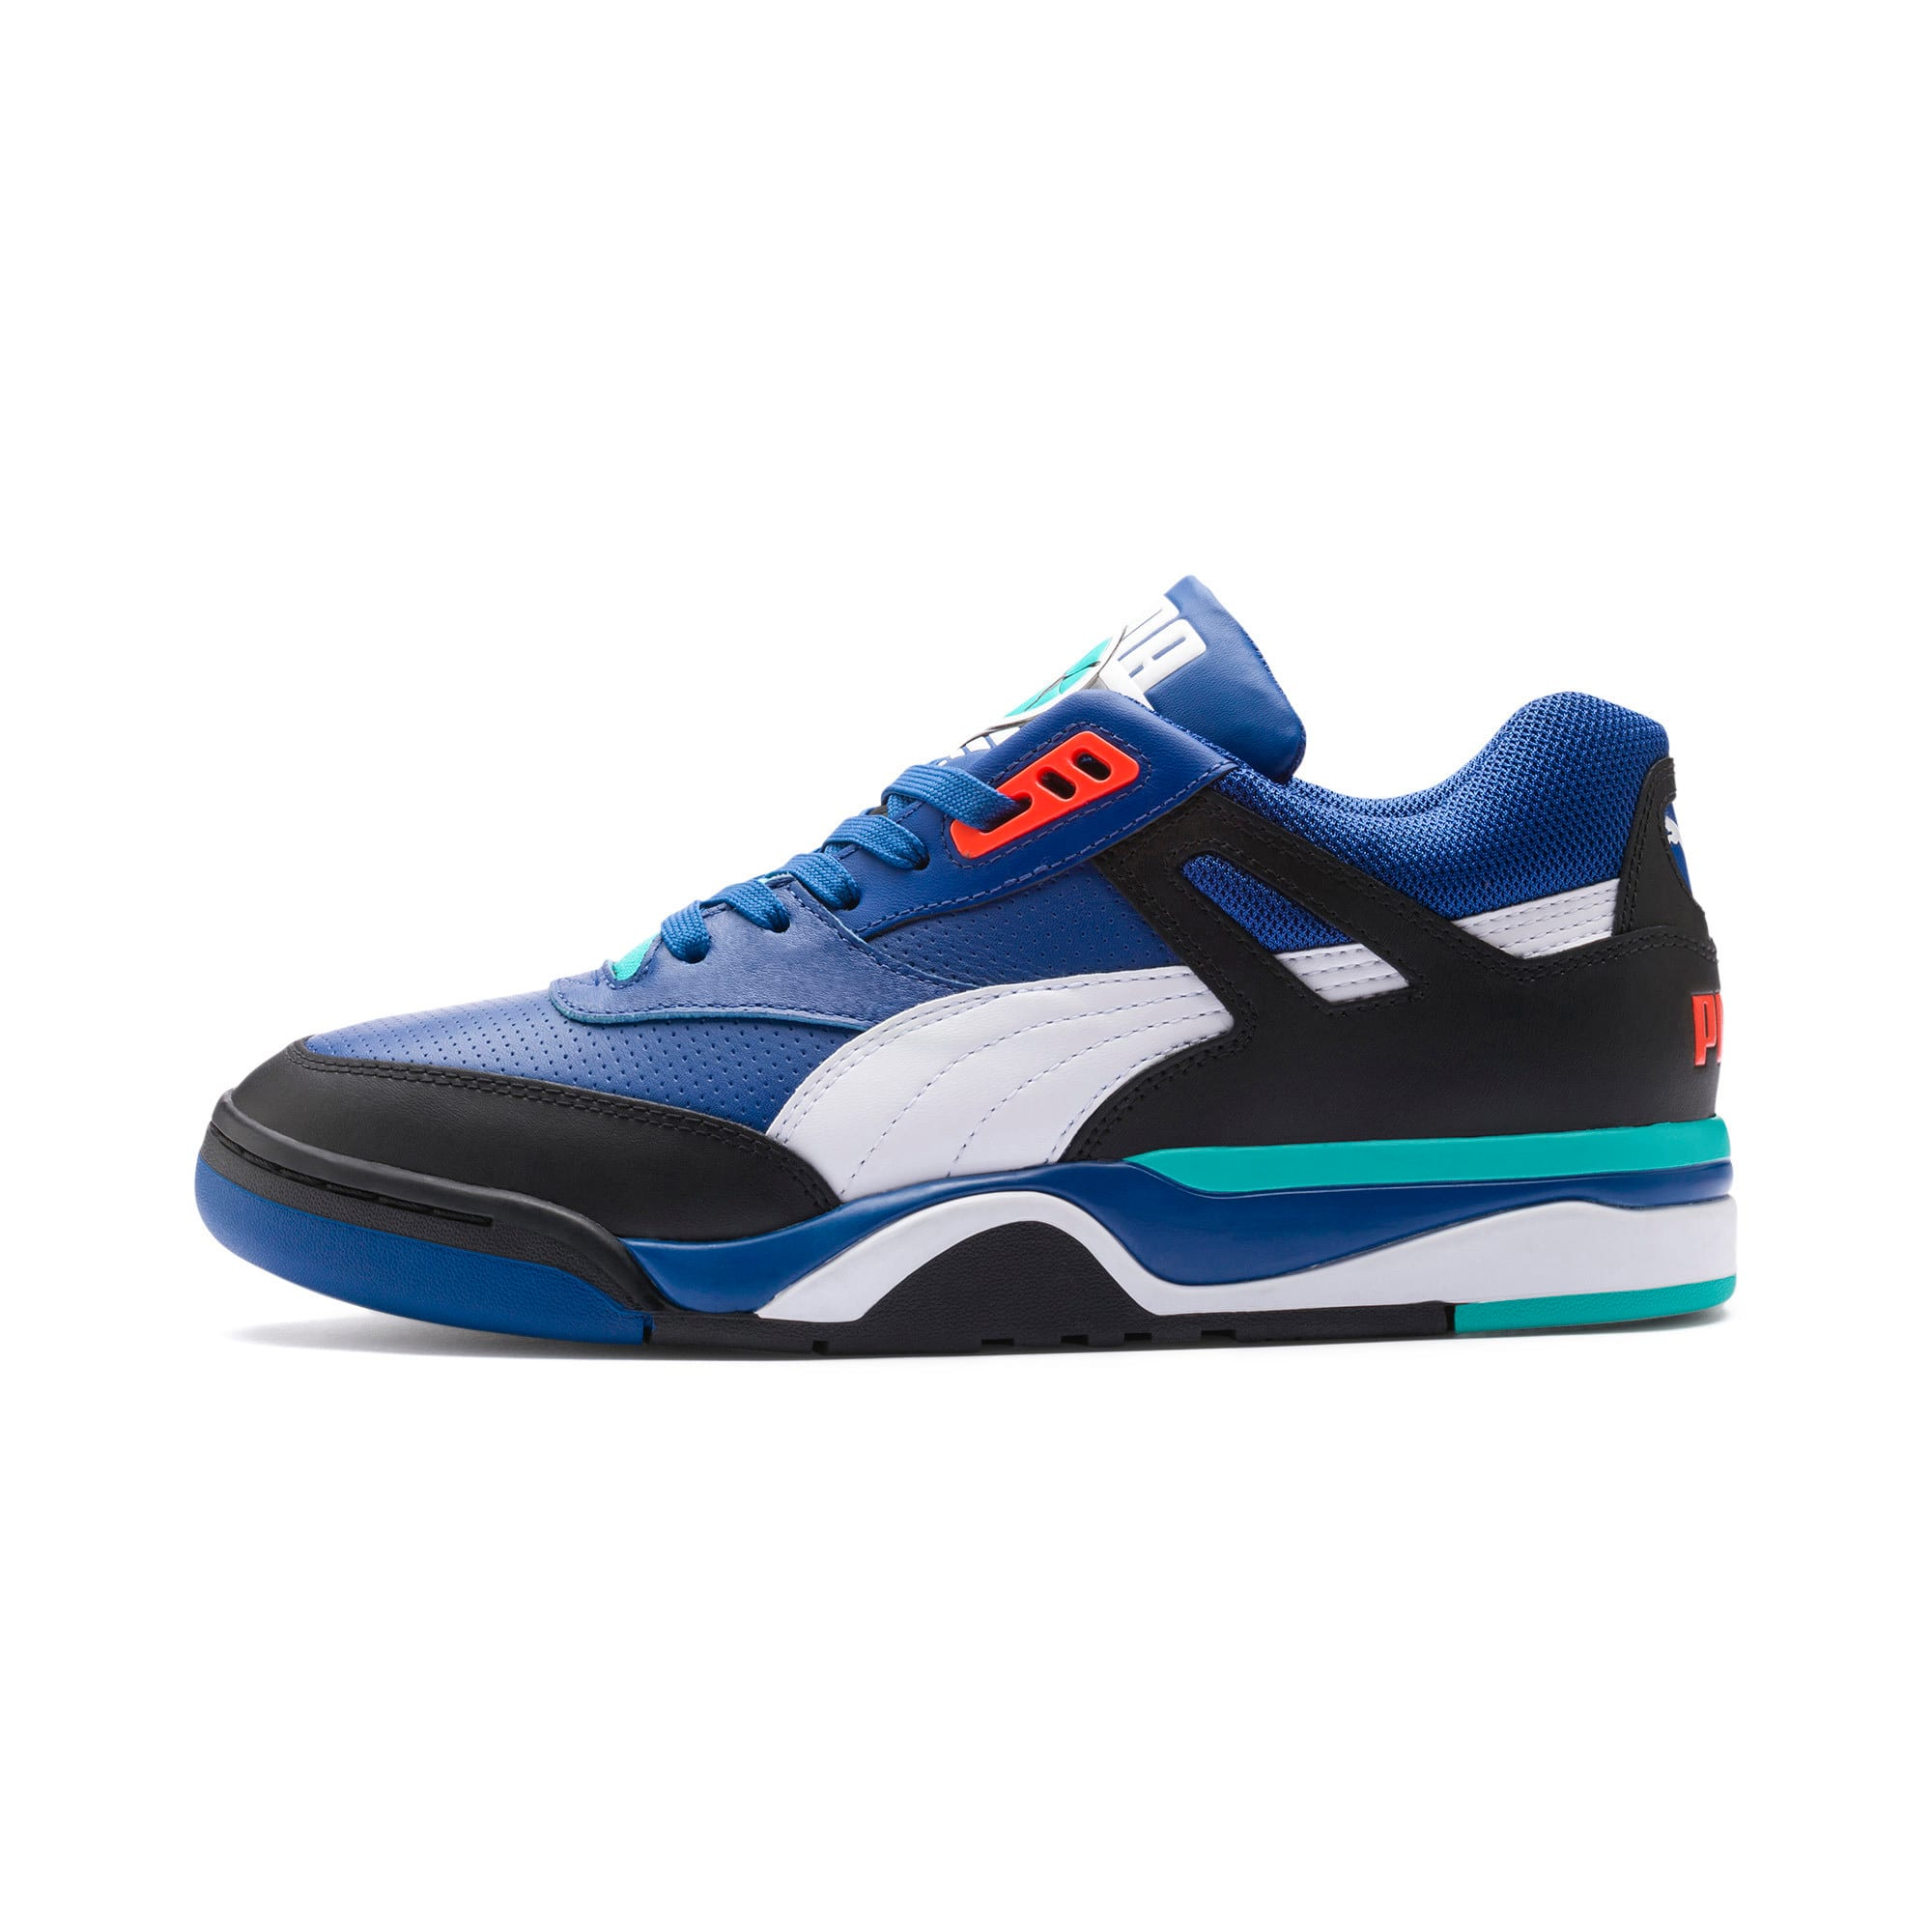 Thumbnail 1 of Palace Guard Sneakers, Puma Black-Puma White-Blue, medium